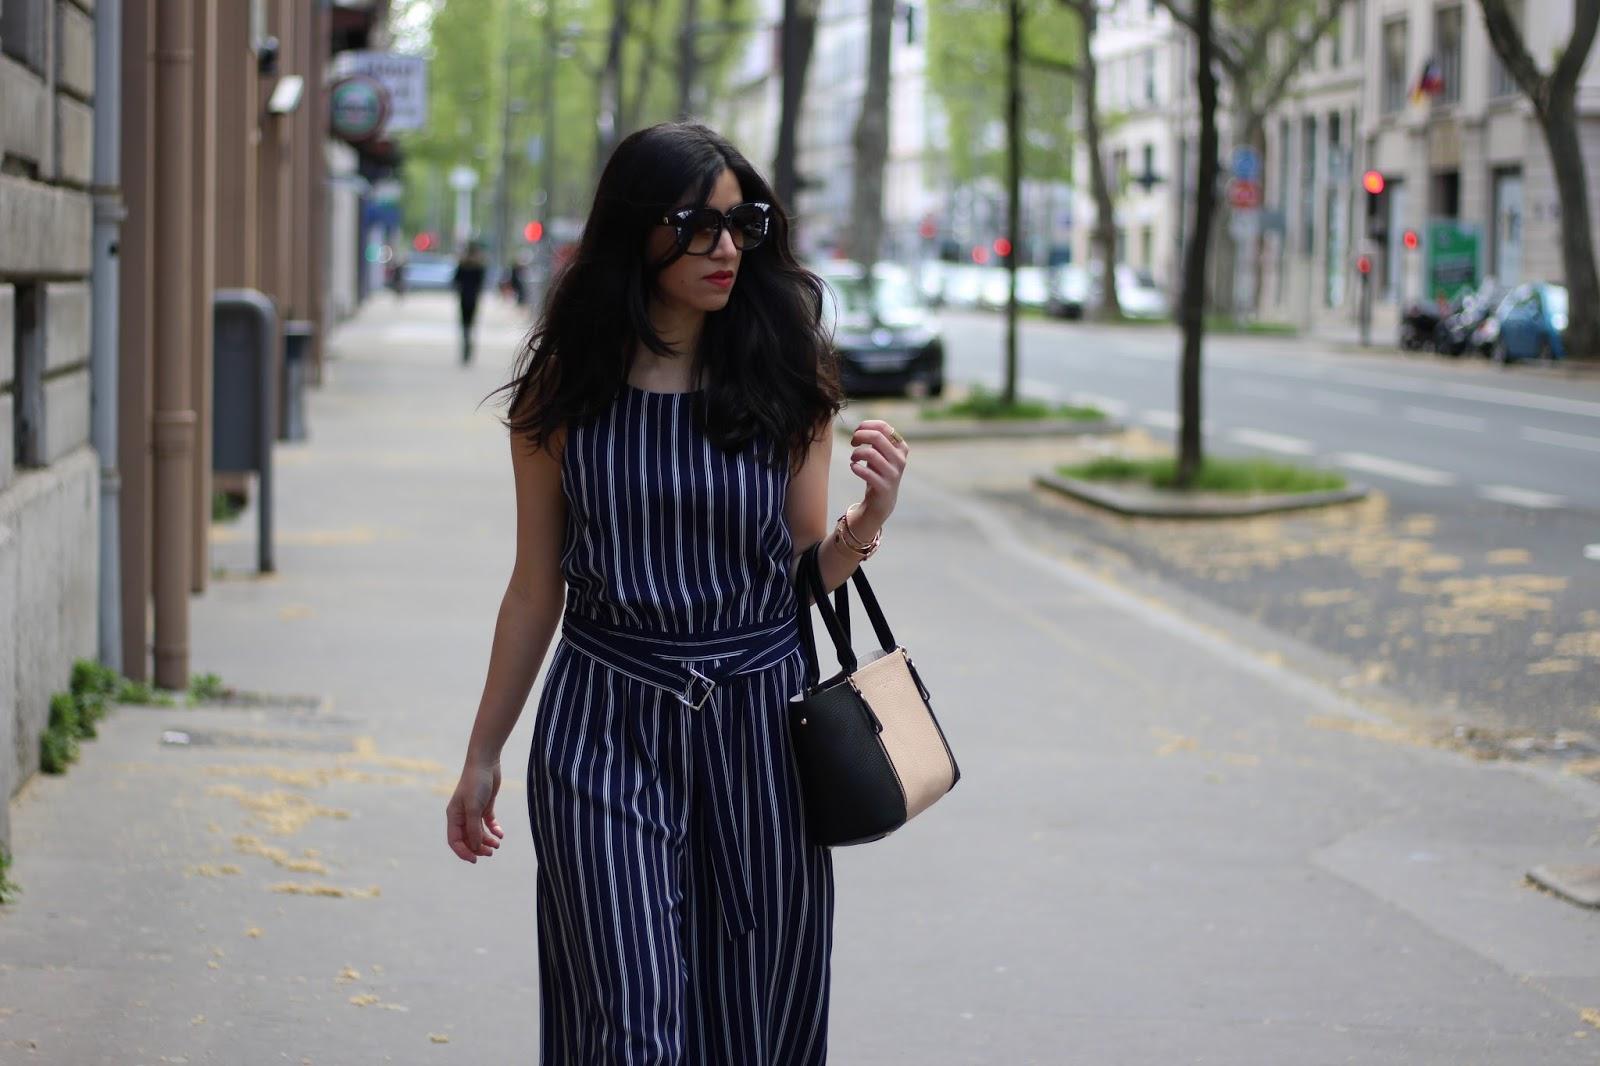 blog mode, blog mode lyon, blog mode lyon paris, blog mode paris, newlook, discoverss16, blogueuse mode, blogueuse lyonnaise, combinaison rayée, emmanuelle khanh, sabatier 1947